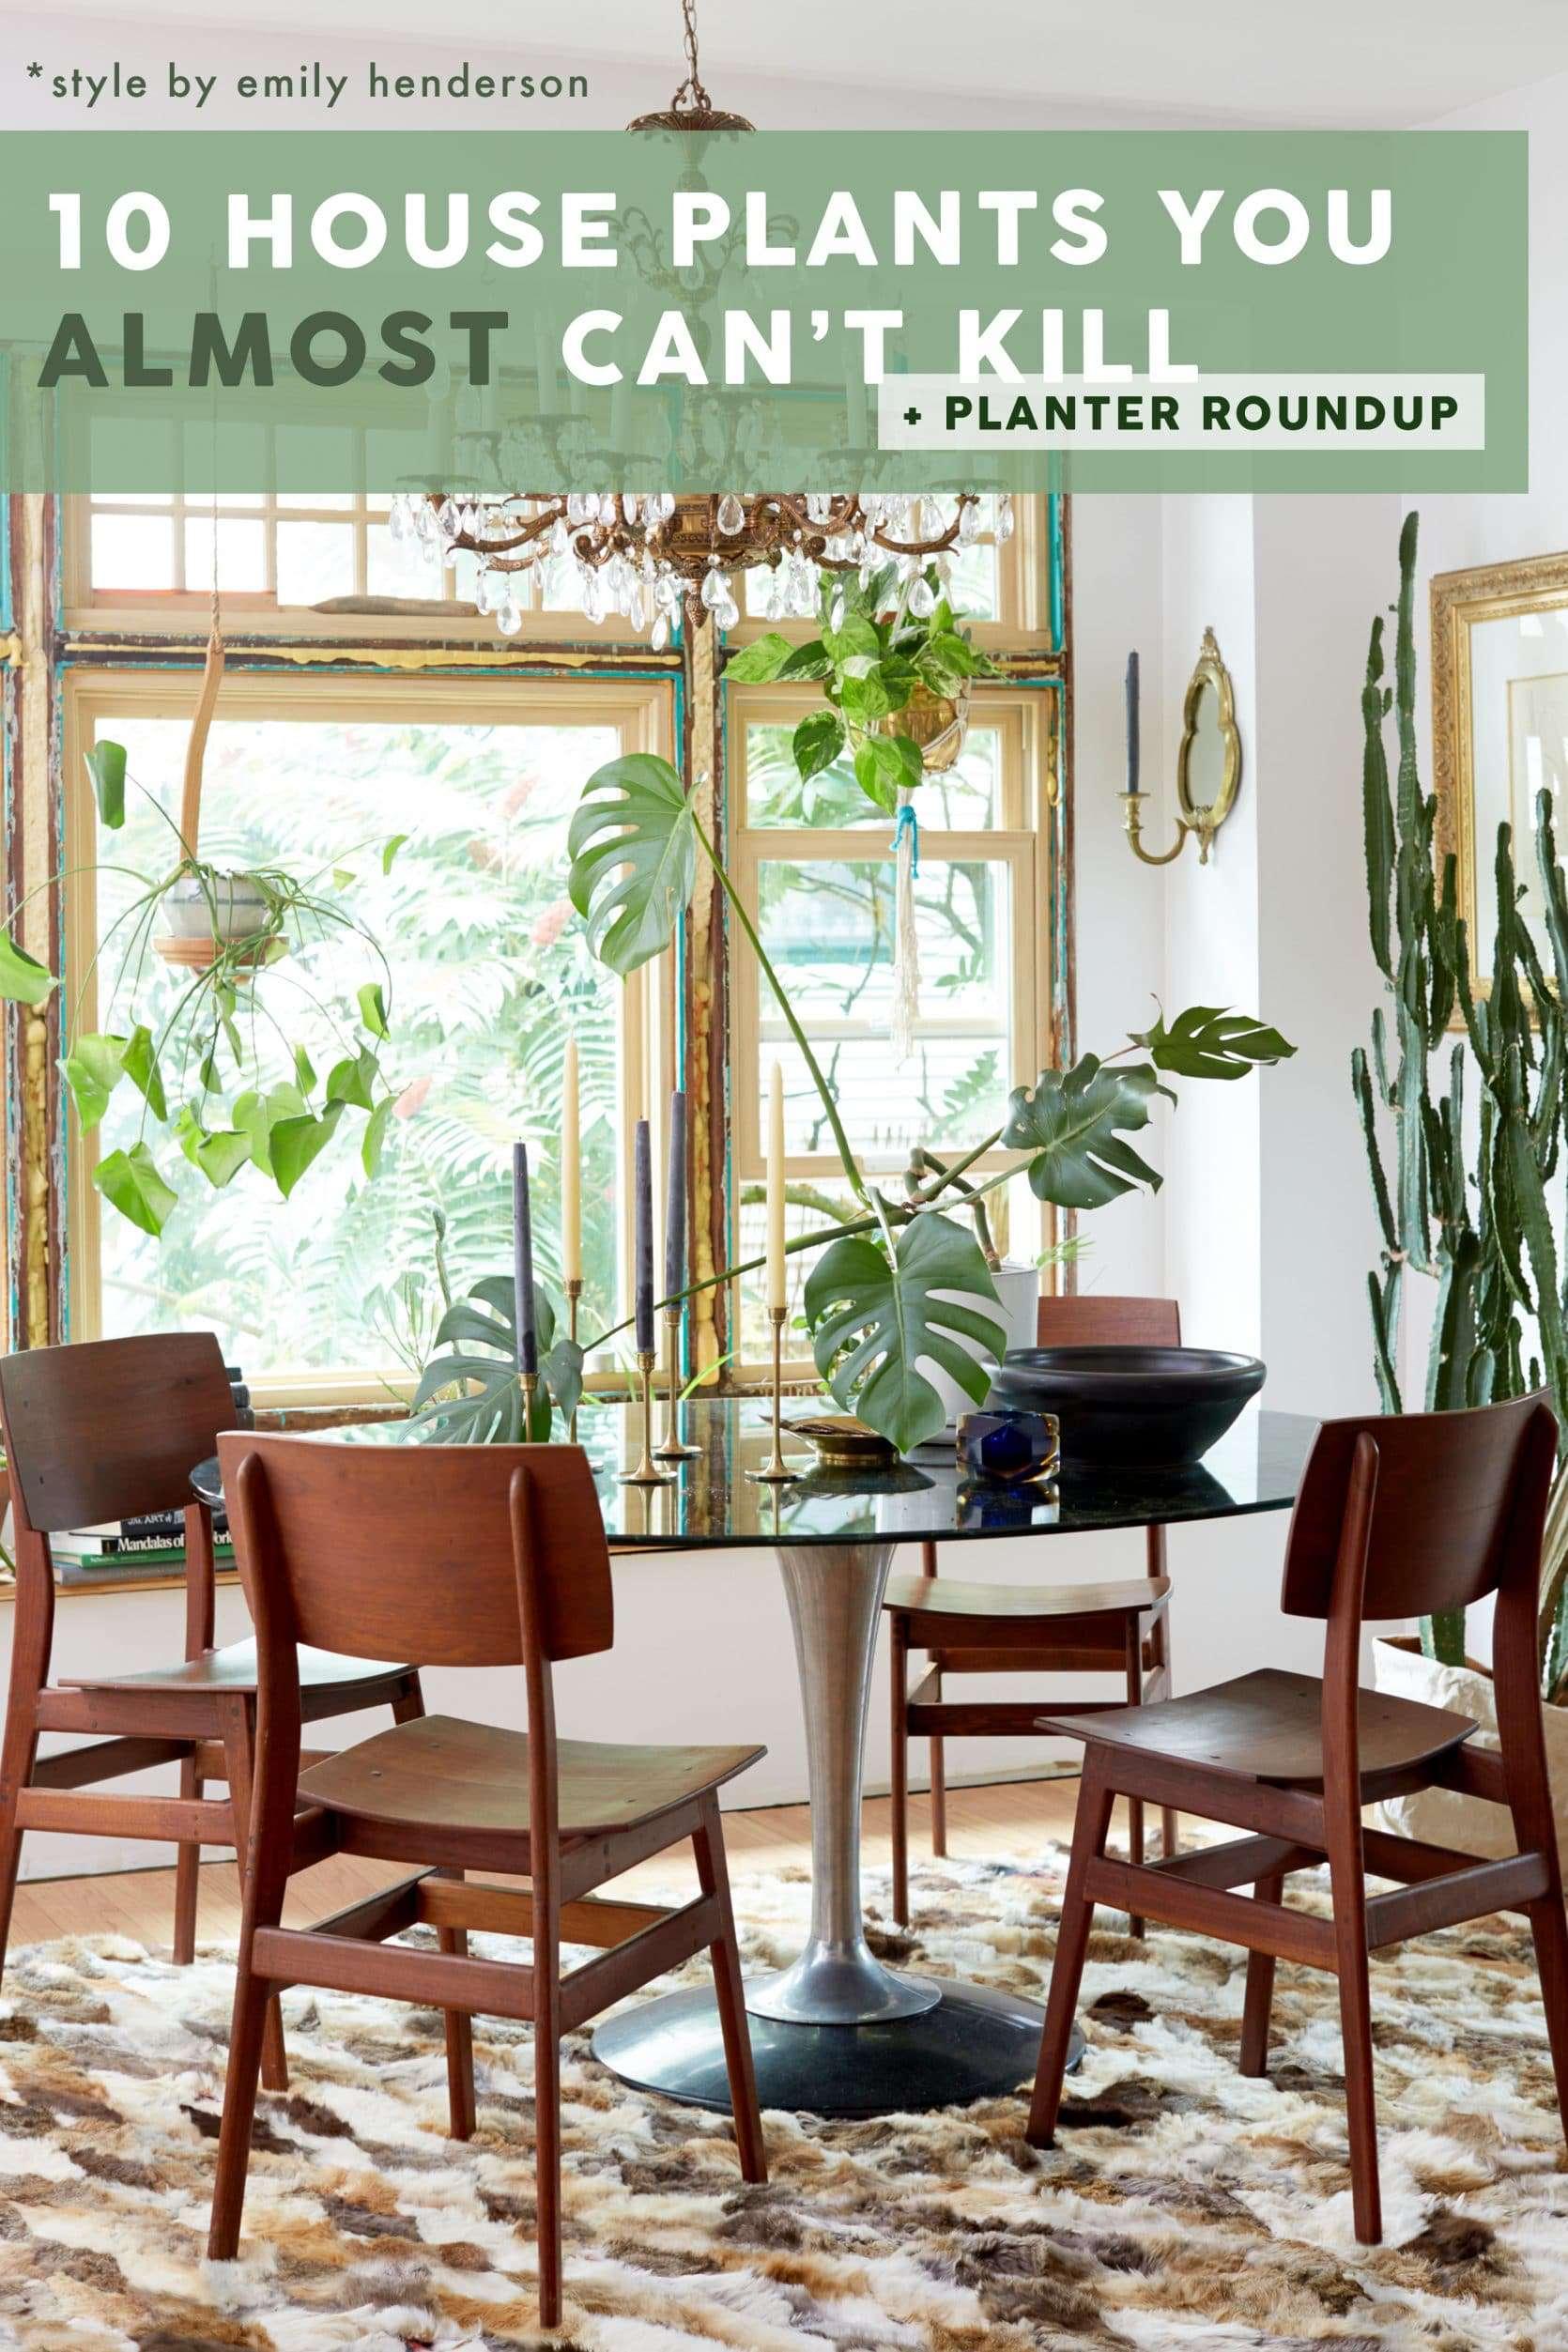 Emily Henderson Plants 10 Cant Kill House Plants 2500 Pinterest